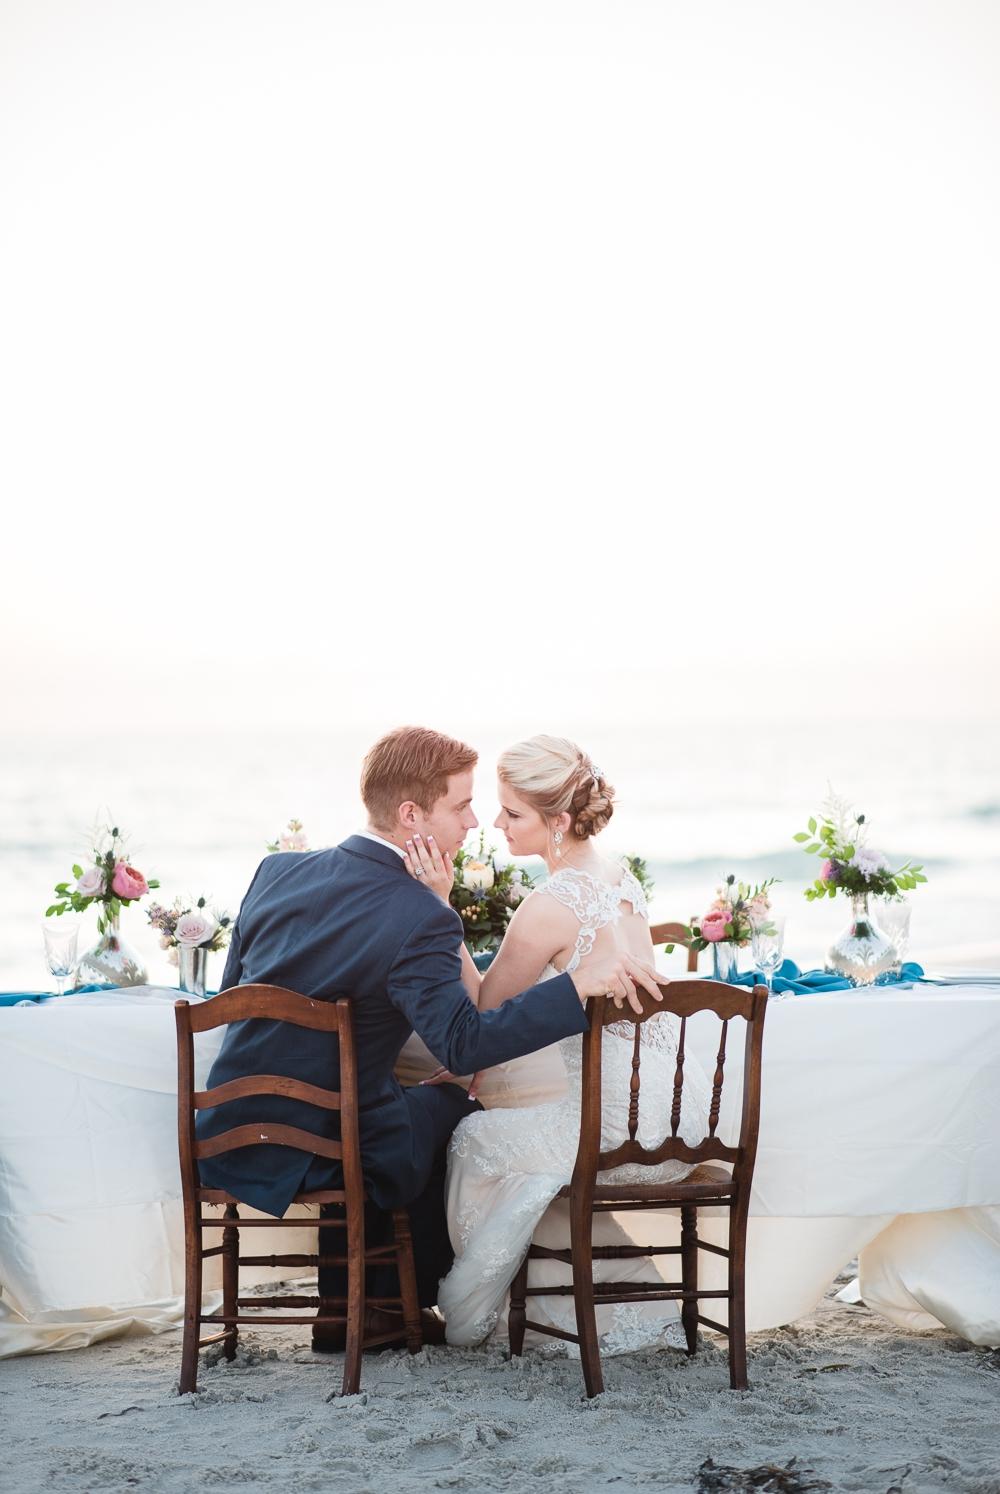 2016 HLM Wedding Beach Shoot 22.jpg